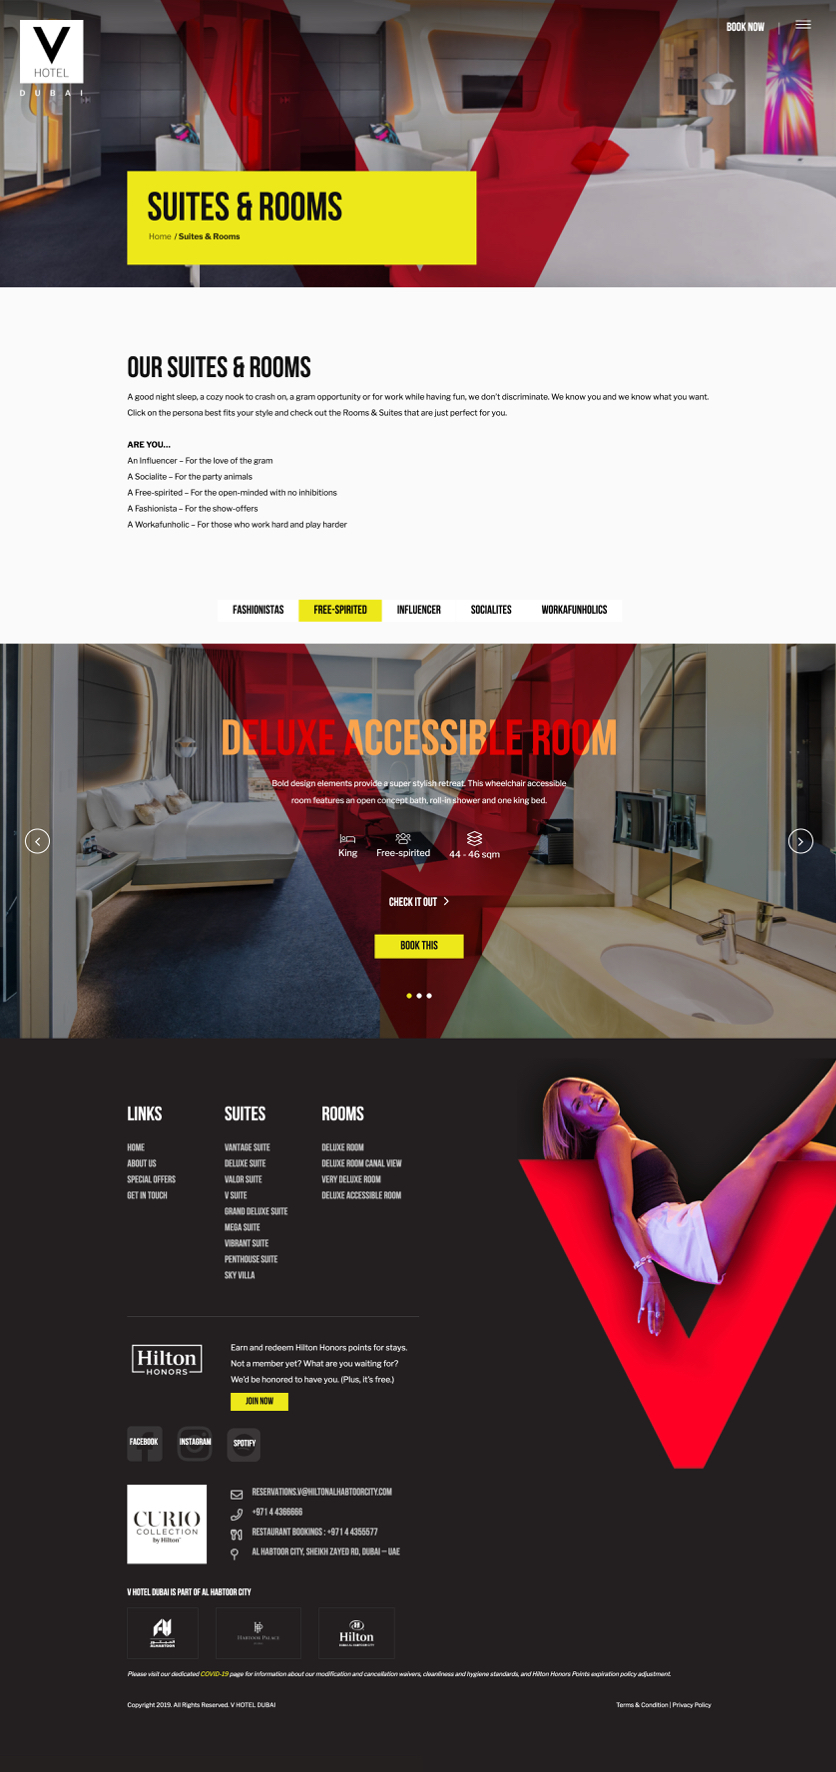 Web Image Gallery 2-1